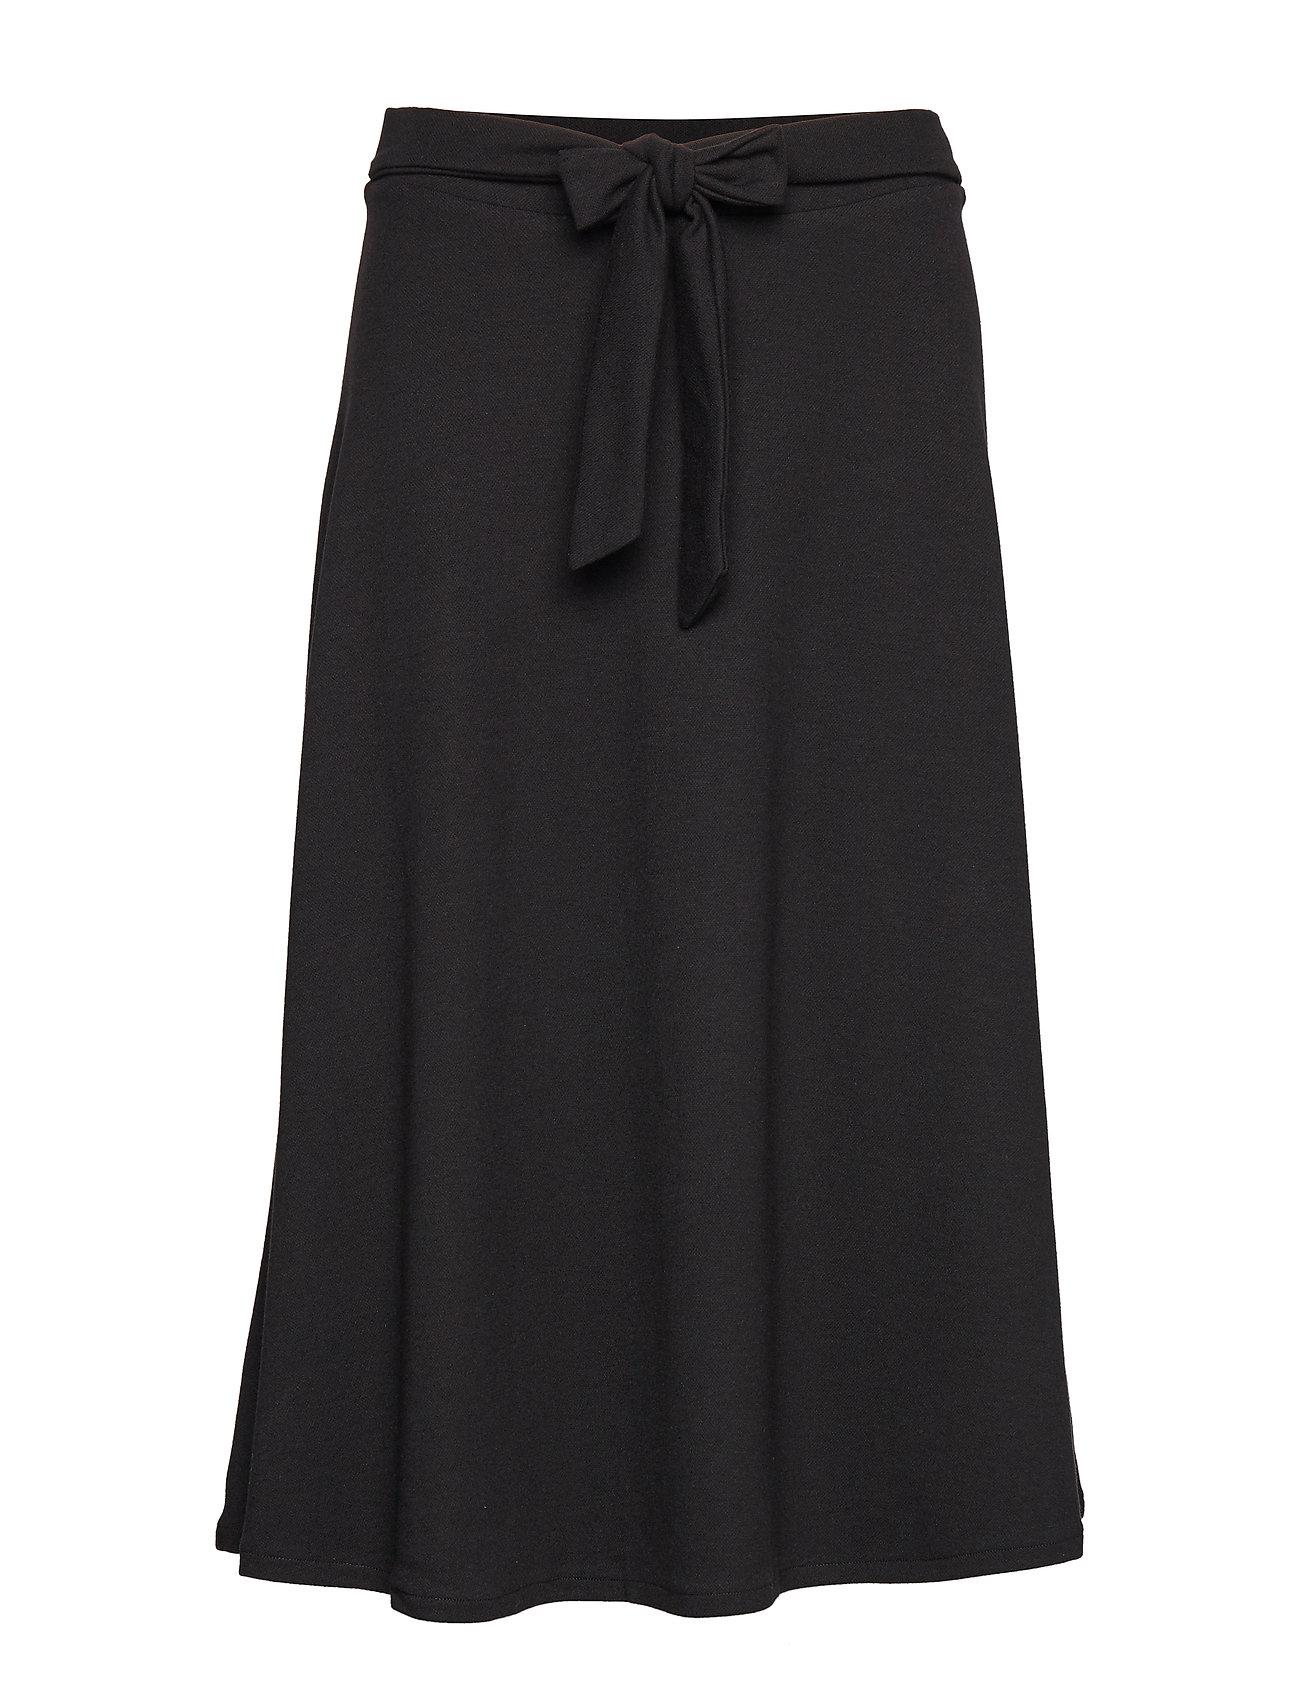 By KnittedblackEdc Esprit Skirts KnittedblackEdc Skirts dCQrths